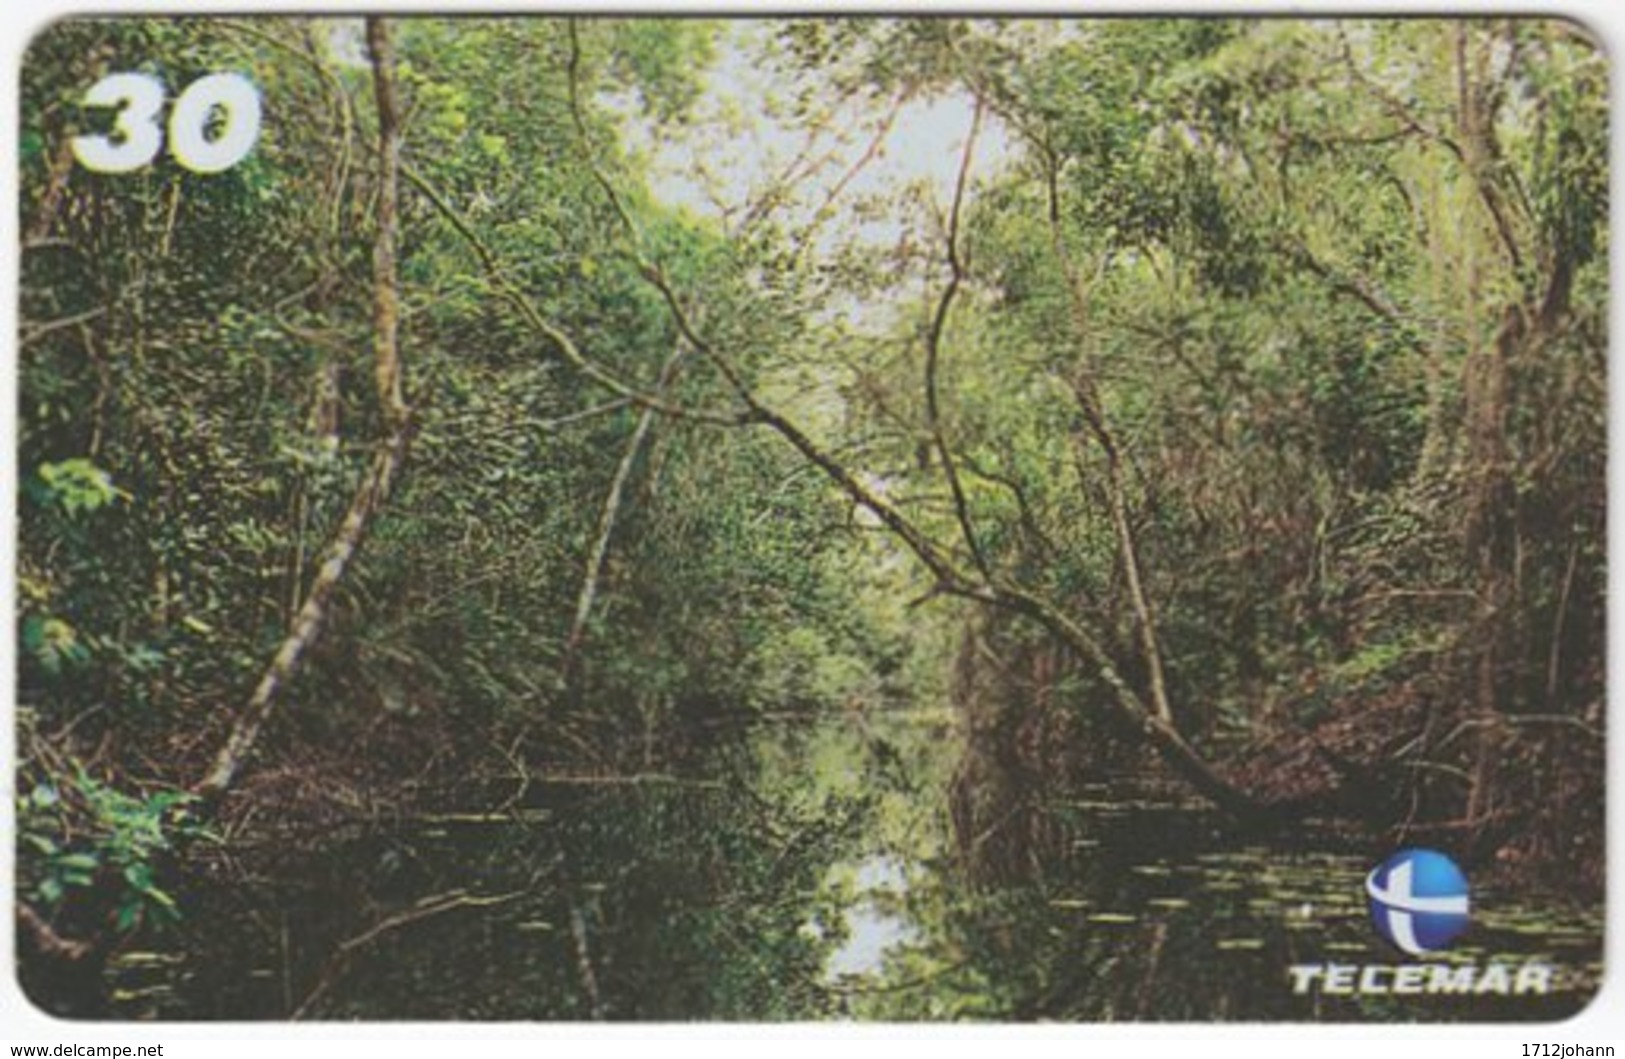 BRASIL I-729 Magnetic Telemar - Landscape, Mangroves - Used - Brasilien